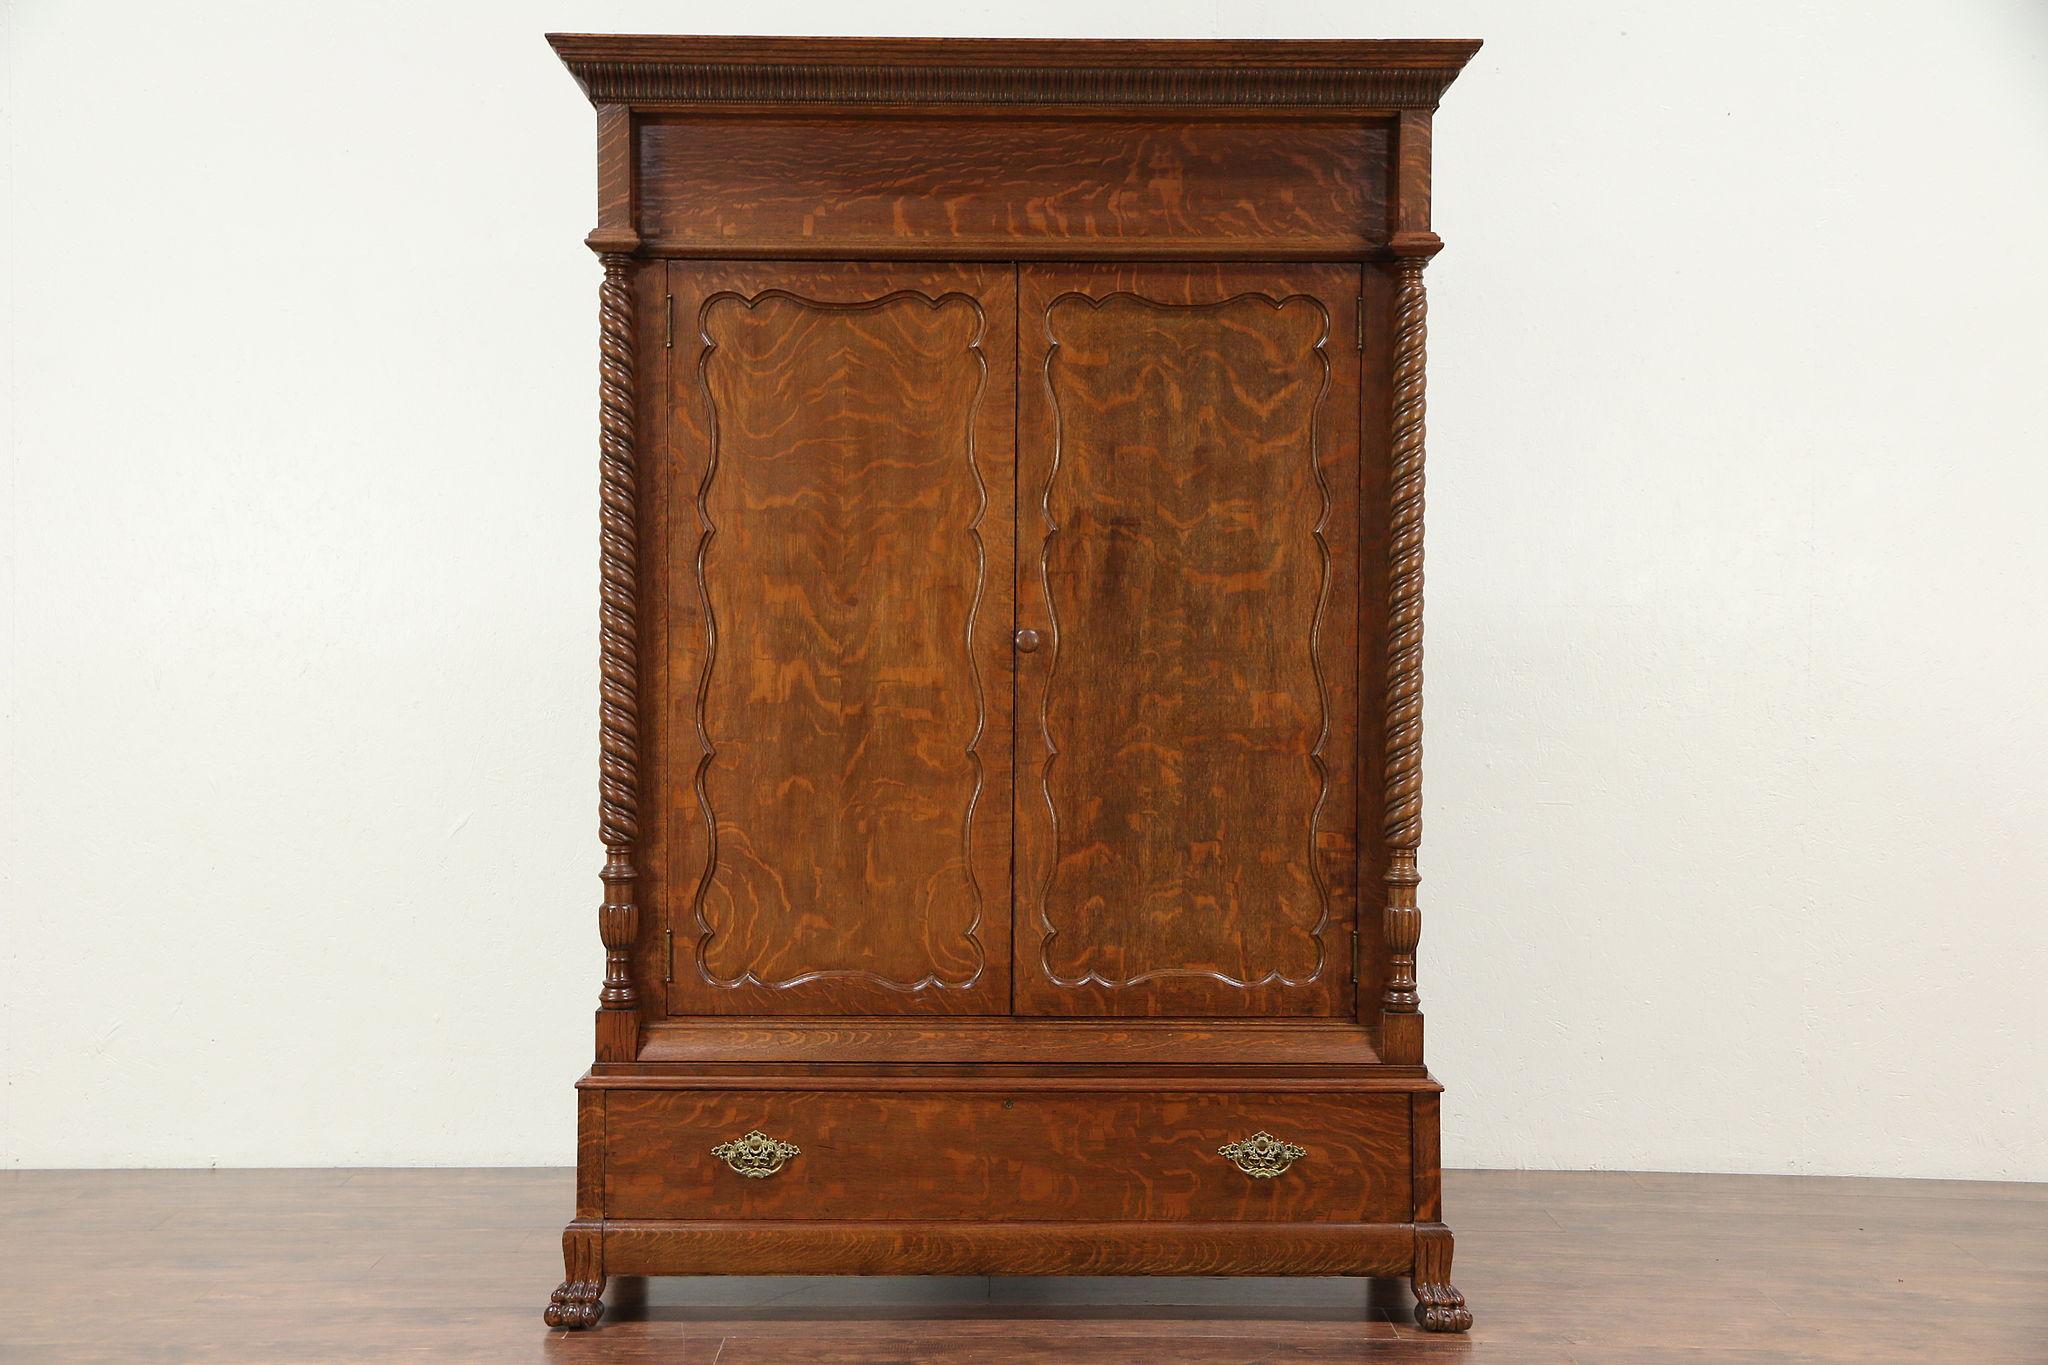 Sold Victorian Oak Antique Armoire Wardrobe Or Closet Spiral Columns 29417 Harp Gallery Antiques Furniture